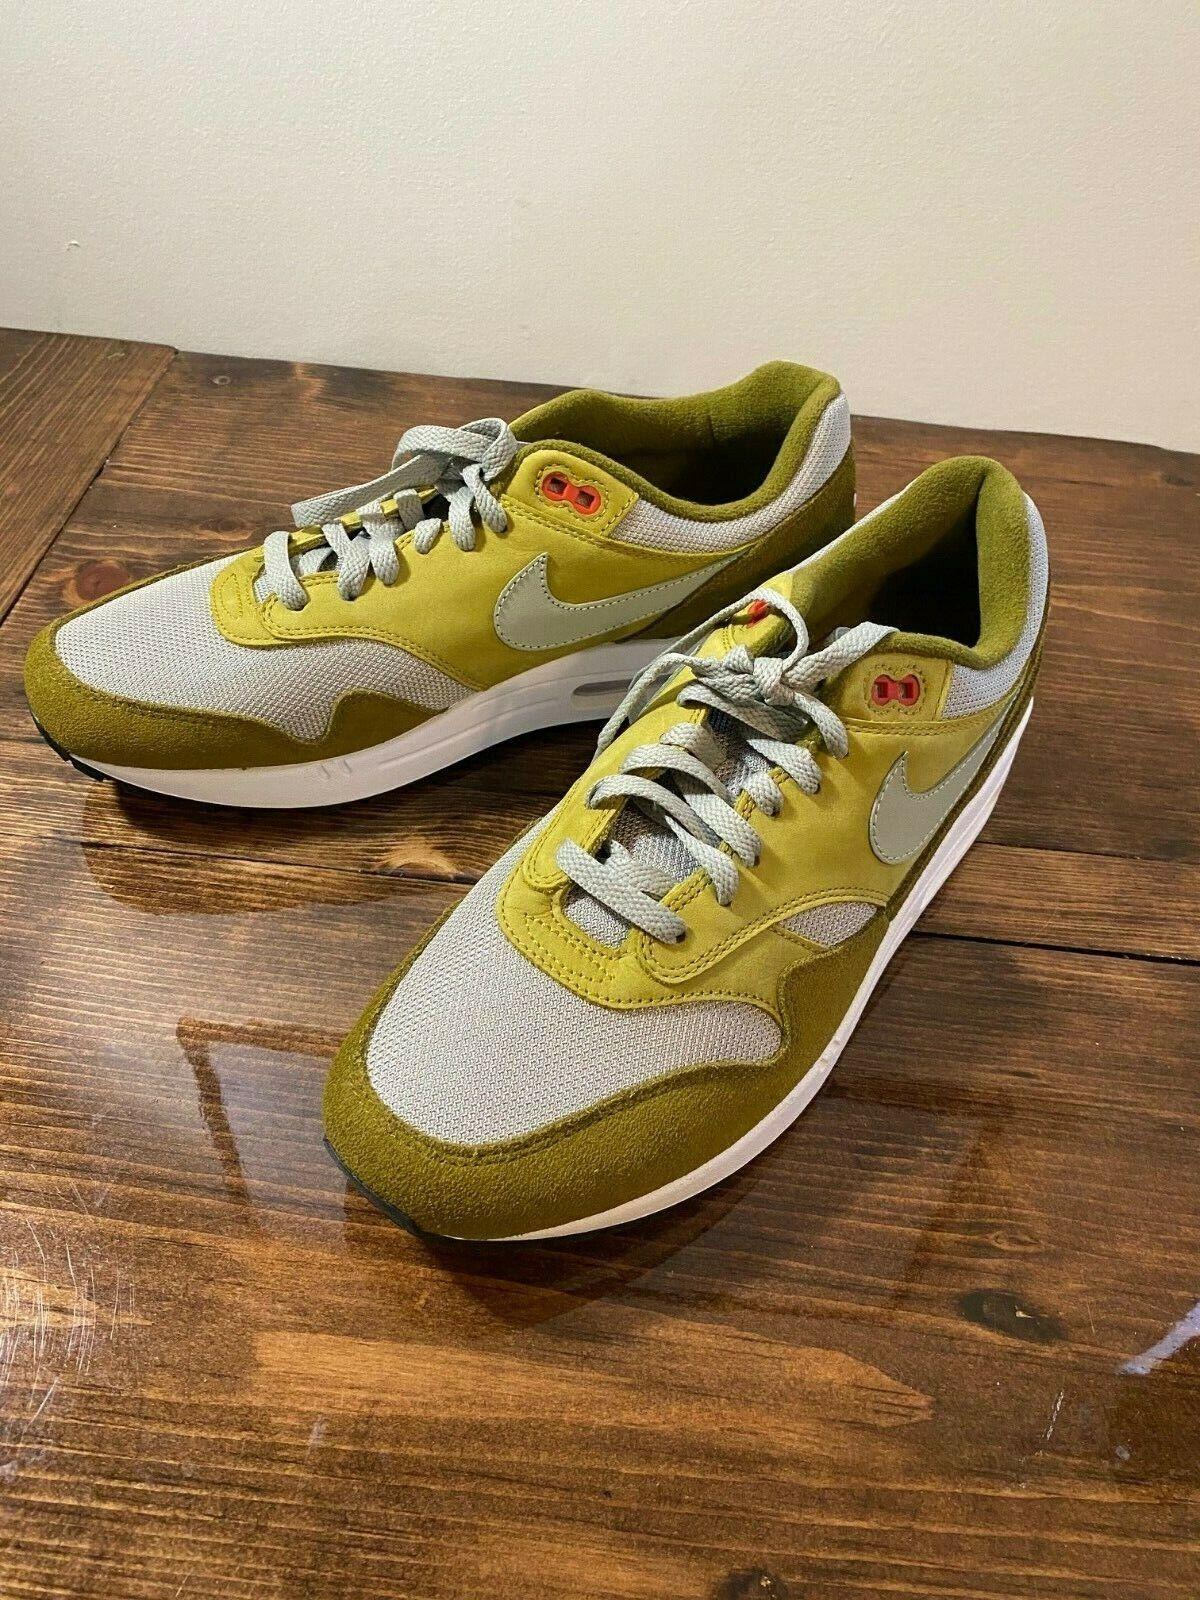 Nike Air Max 1 Premium Retro Curry Pack ~ 908366 300 ~ Uk Size 8